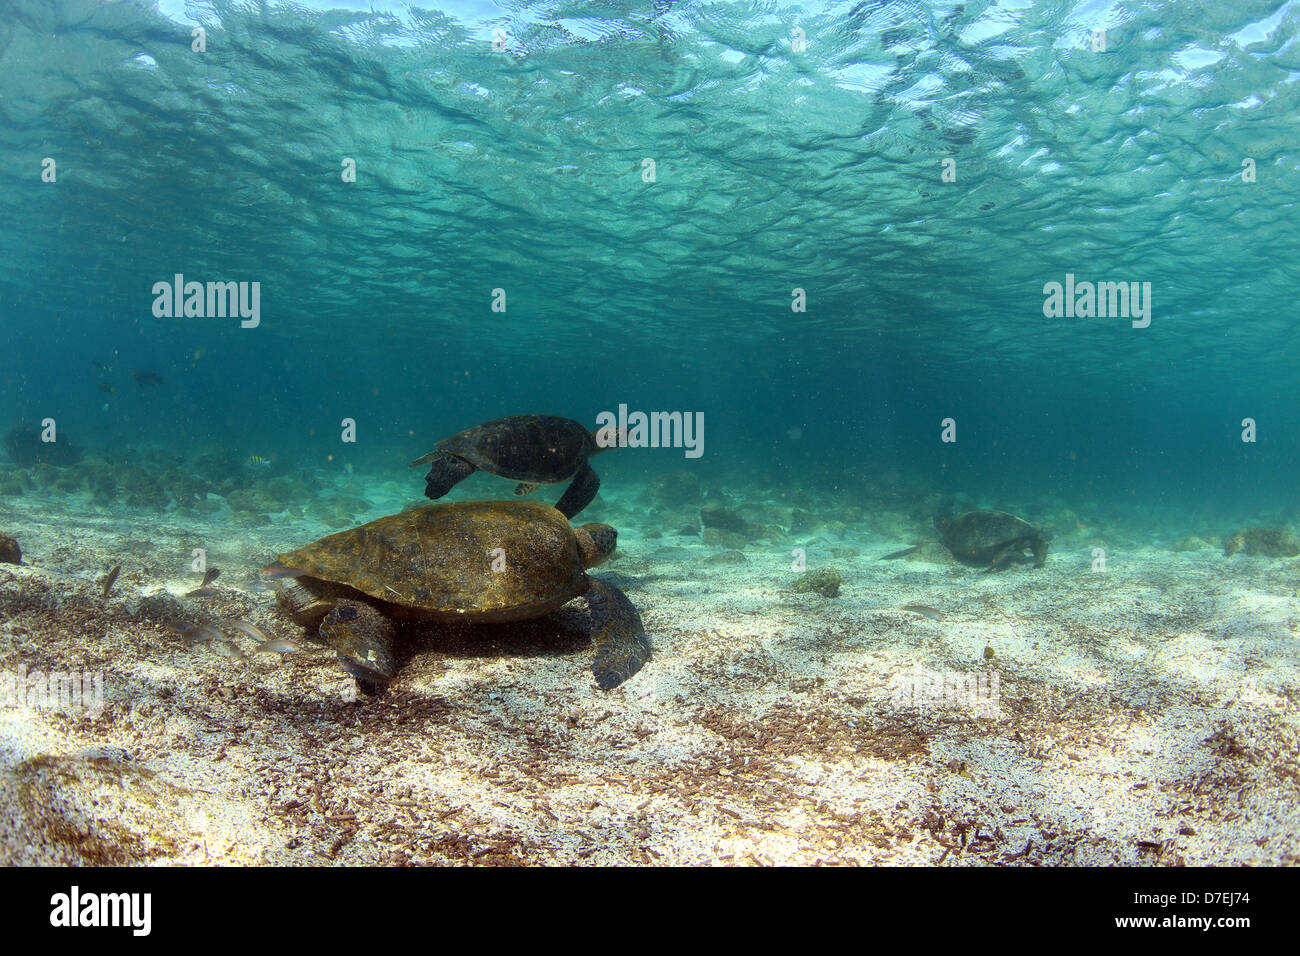 Sea turtles underwater in low tide lagoon, Galapagos Islands - Stock Image